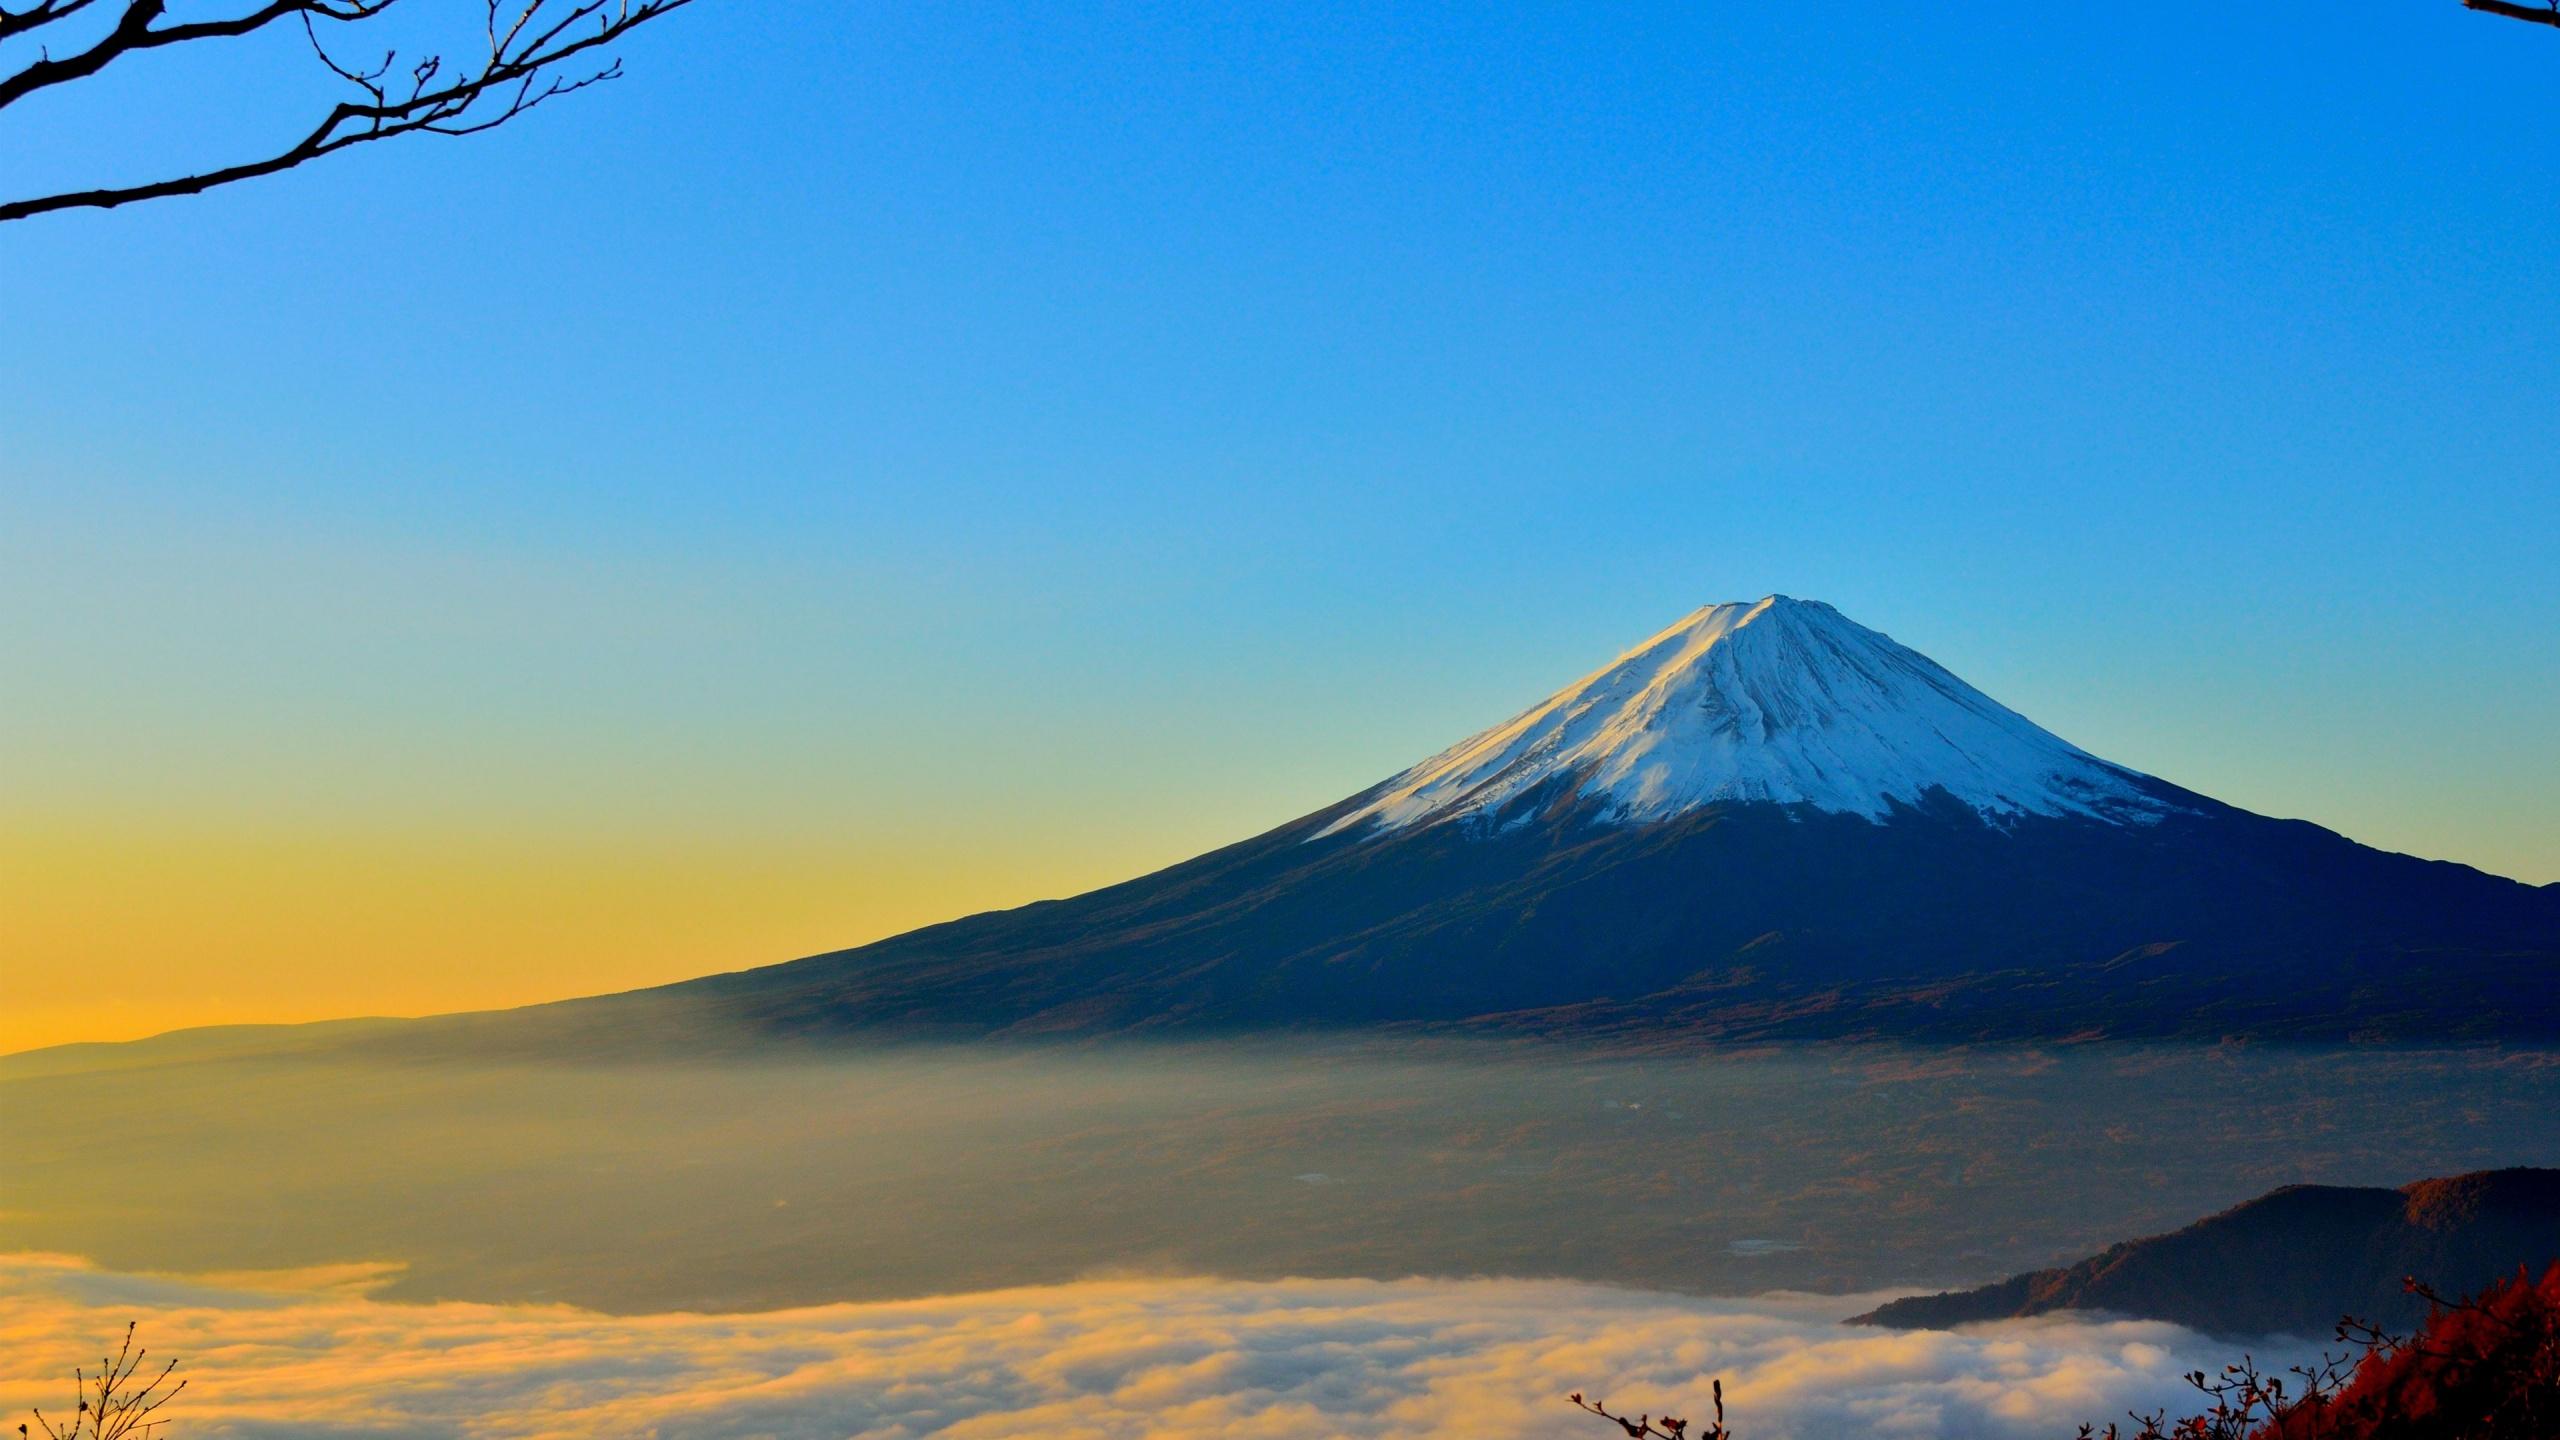 Mount Fuji Hd Wallpaper Background Image 2560x1440